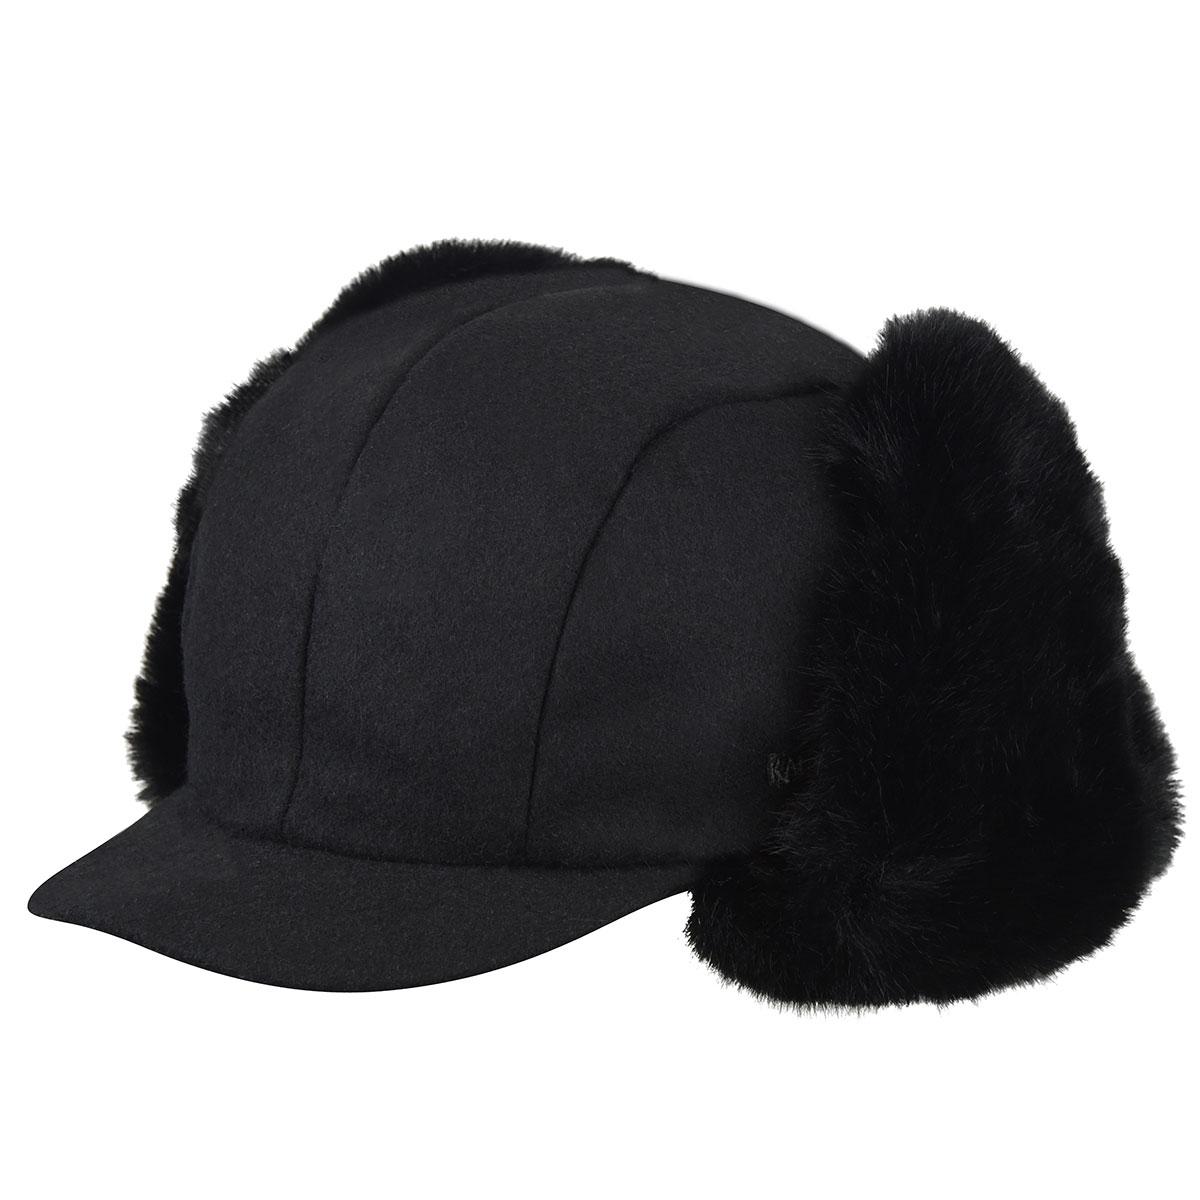 Kangol Wool Aviator in Black,Black